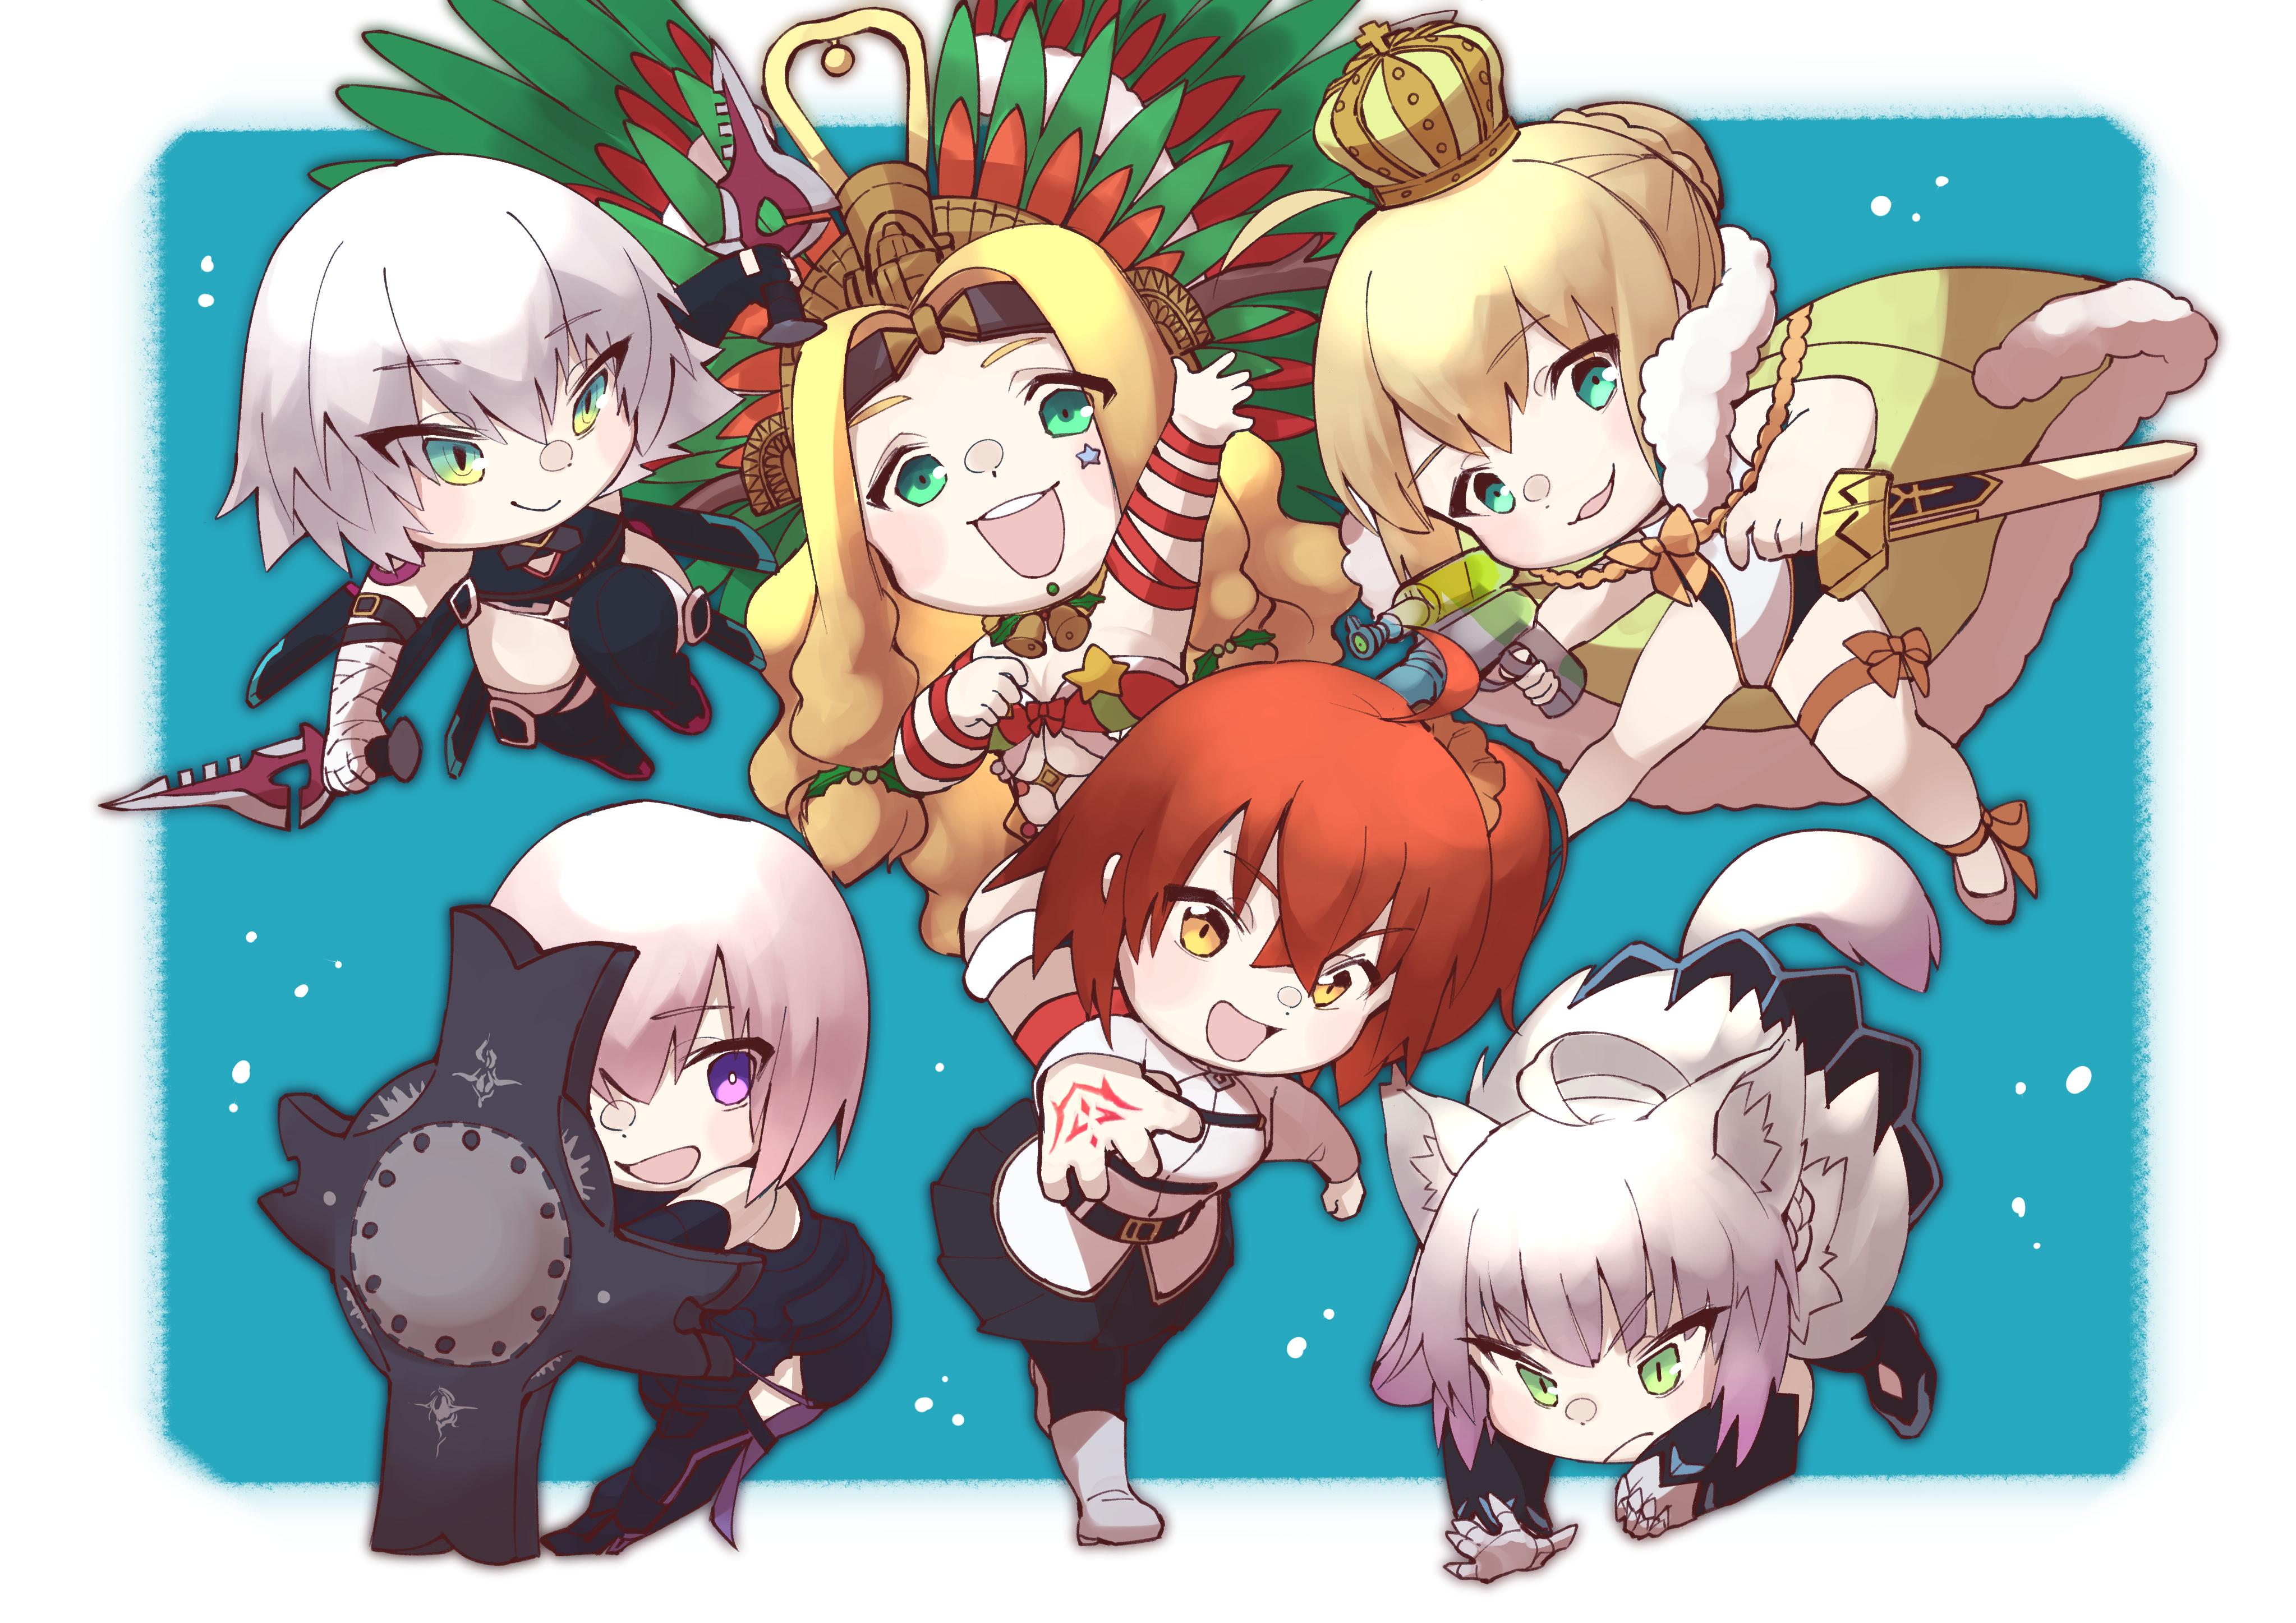 Fate/Grand Order Image #2579295 - Zerochan Anime Image Board